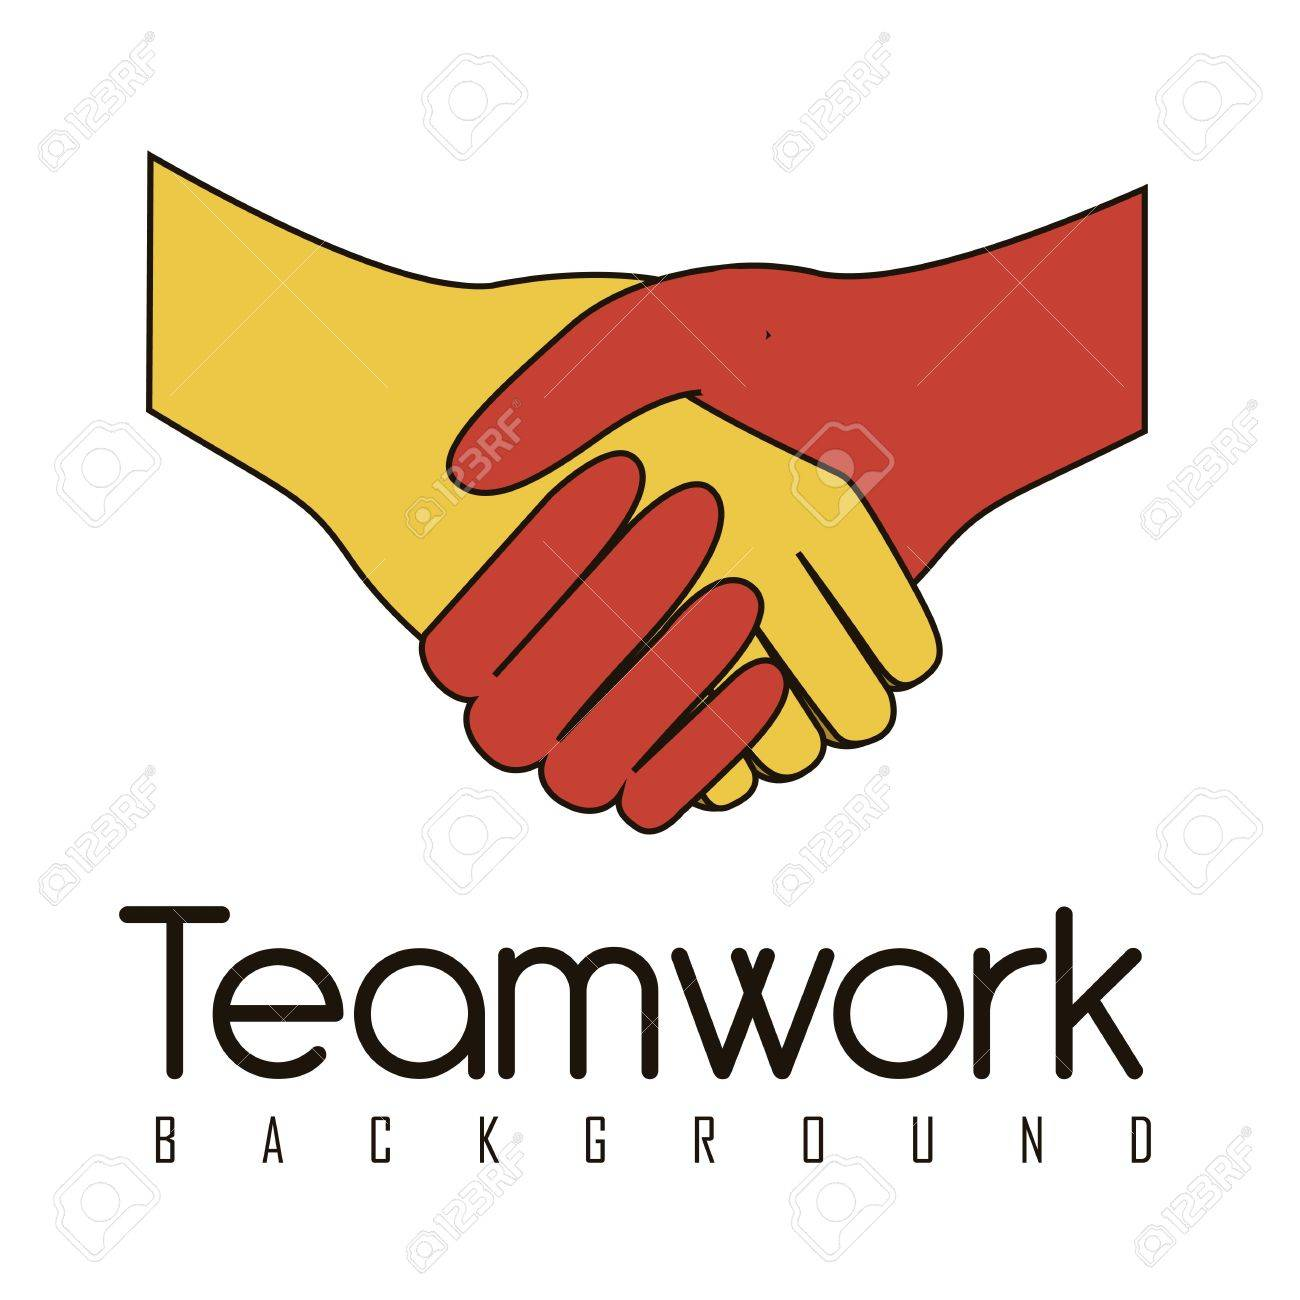 illustration of handshake isolated on white background, vector illustration Stock Vector - 14473076